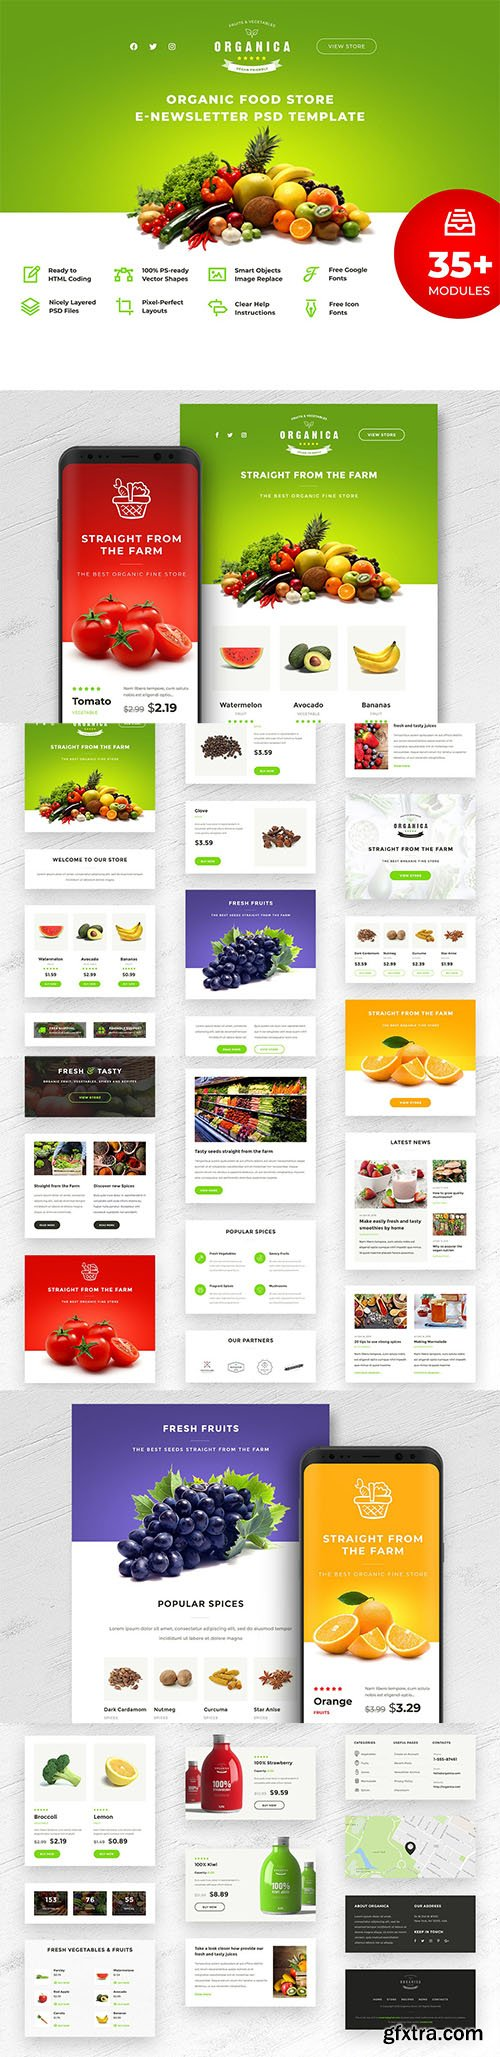 Organica - Food Store E-newsletter PSD Template